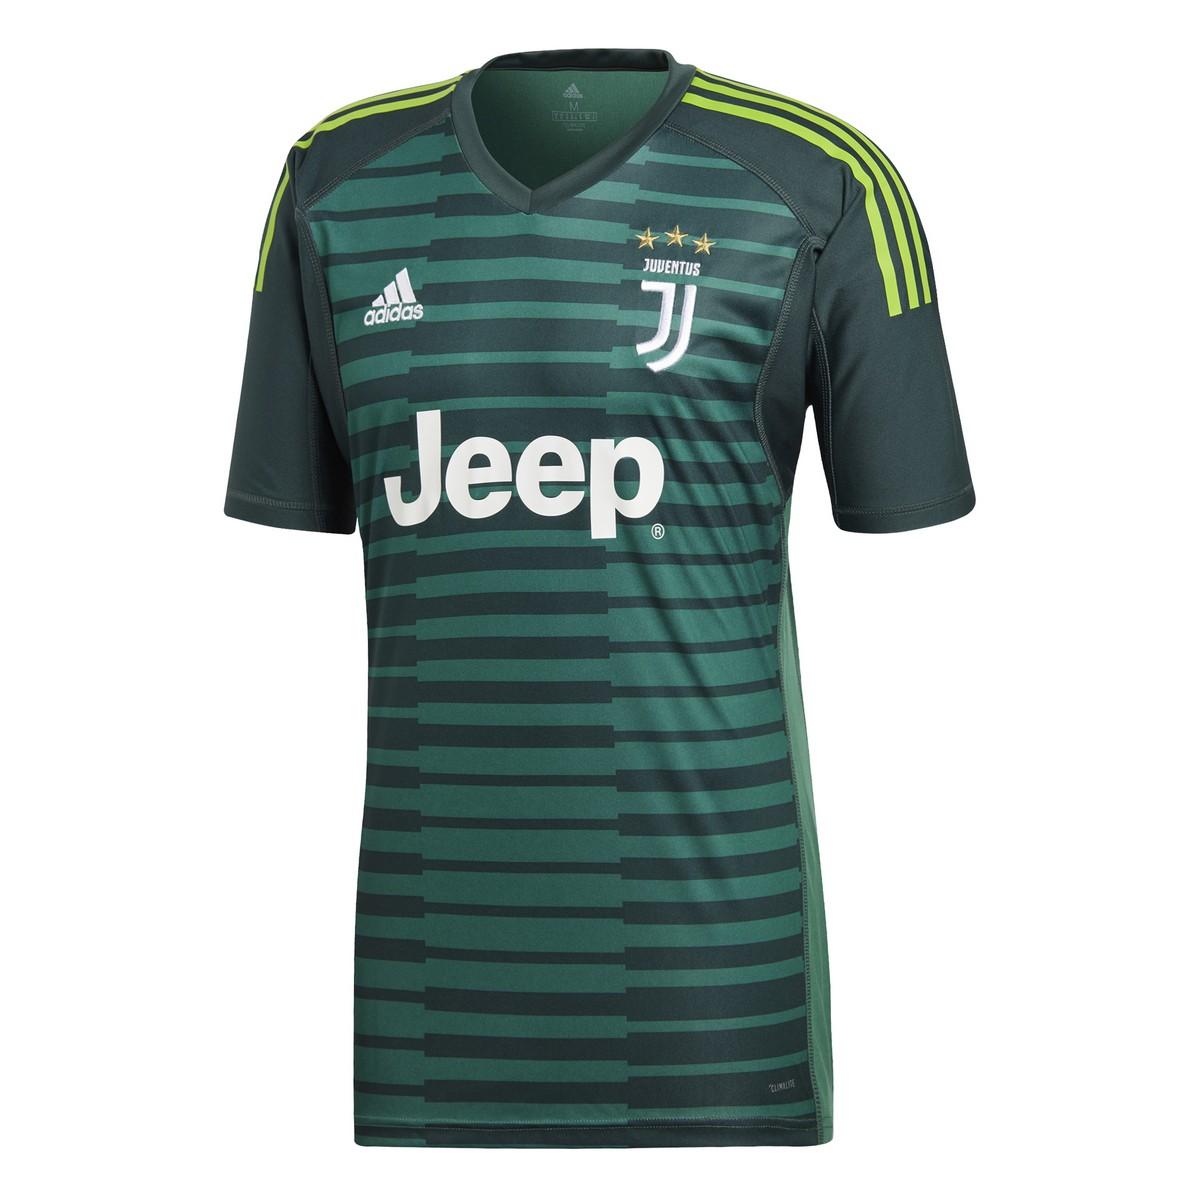 Juventus maglia portiere verde 2018/19 Adidas